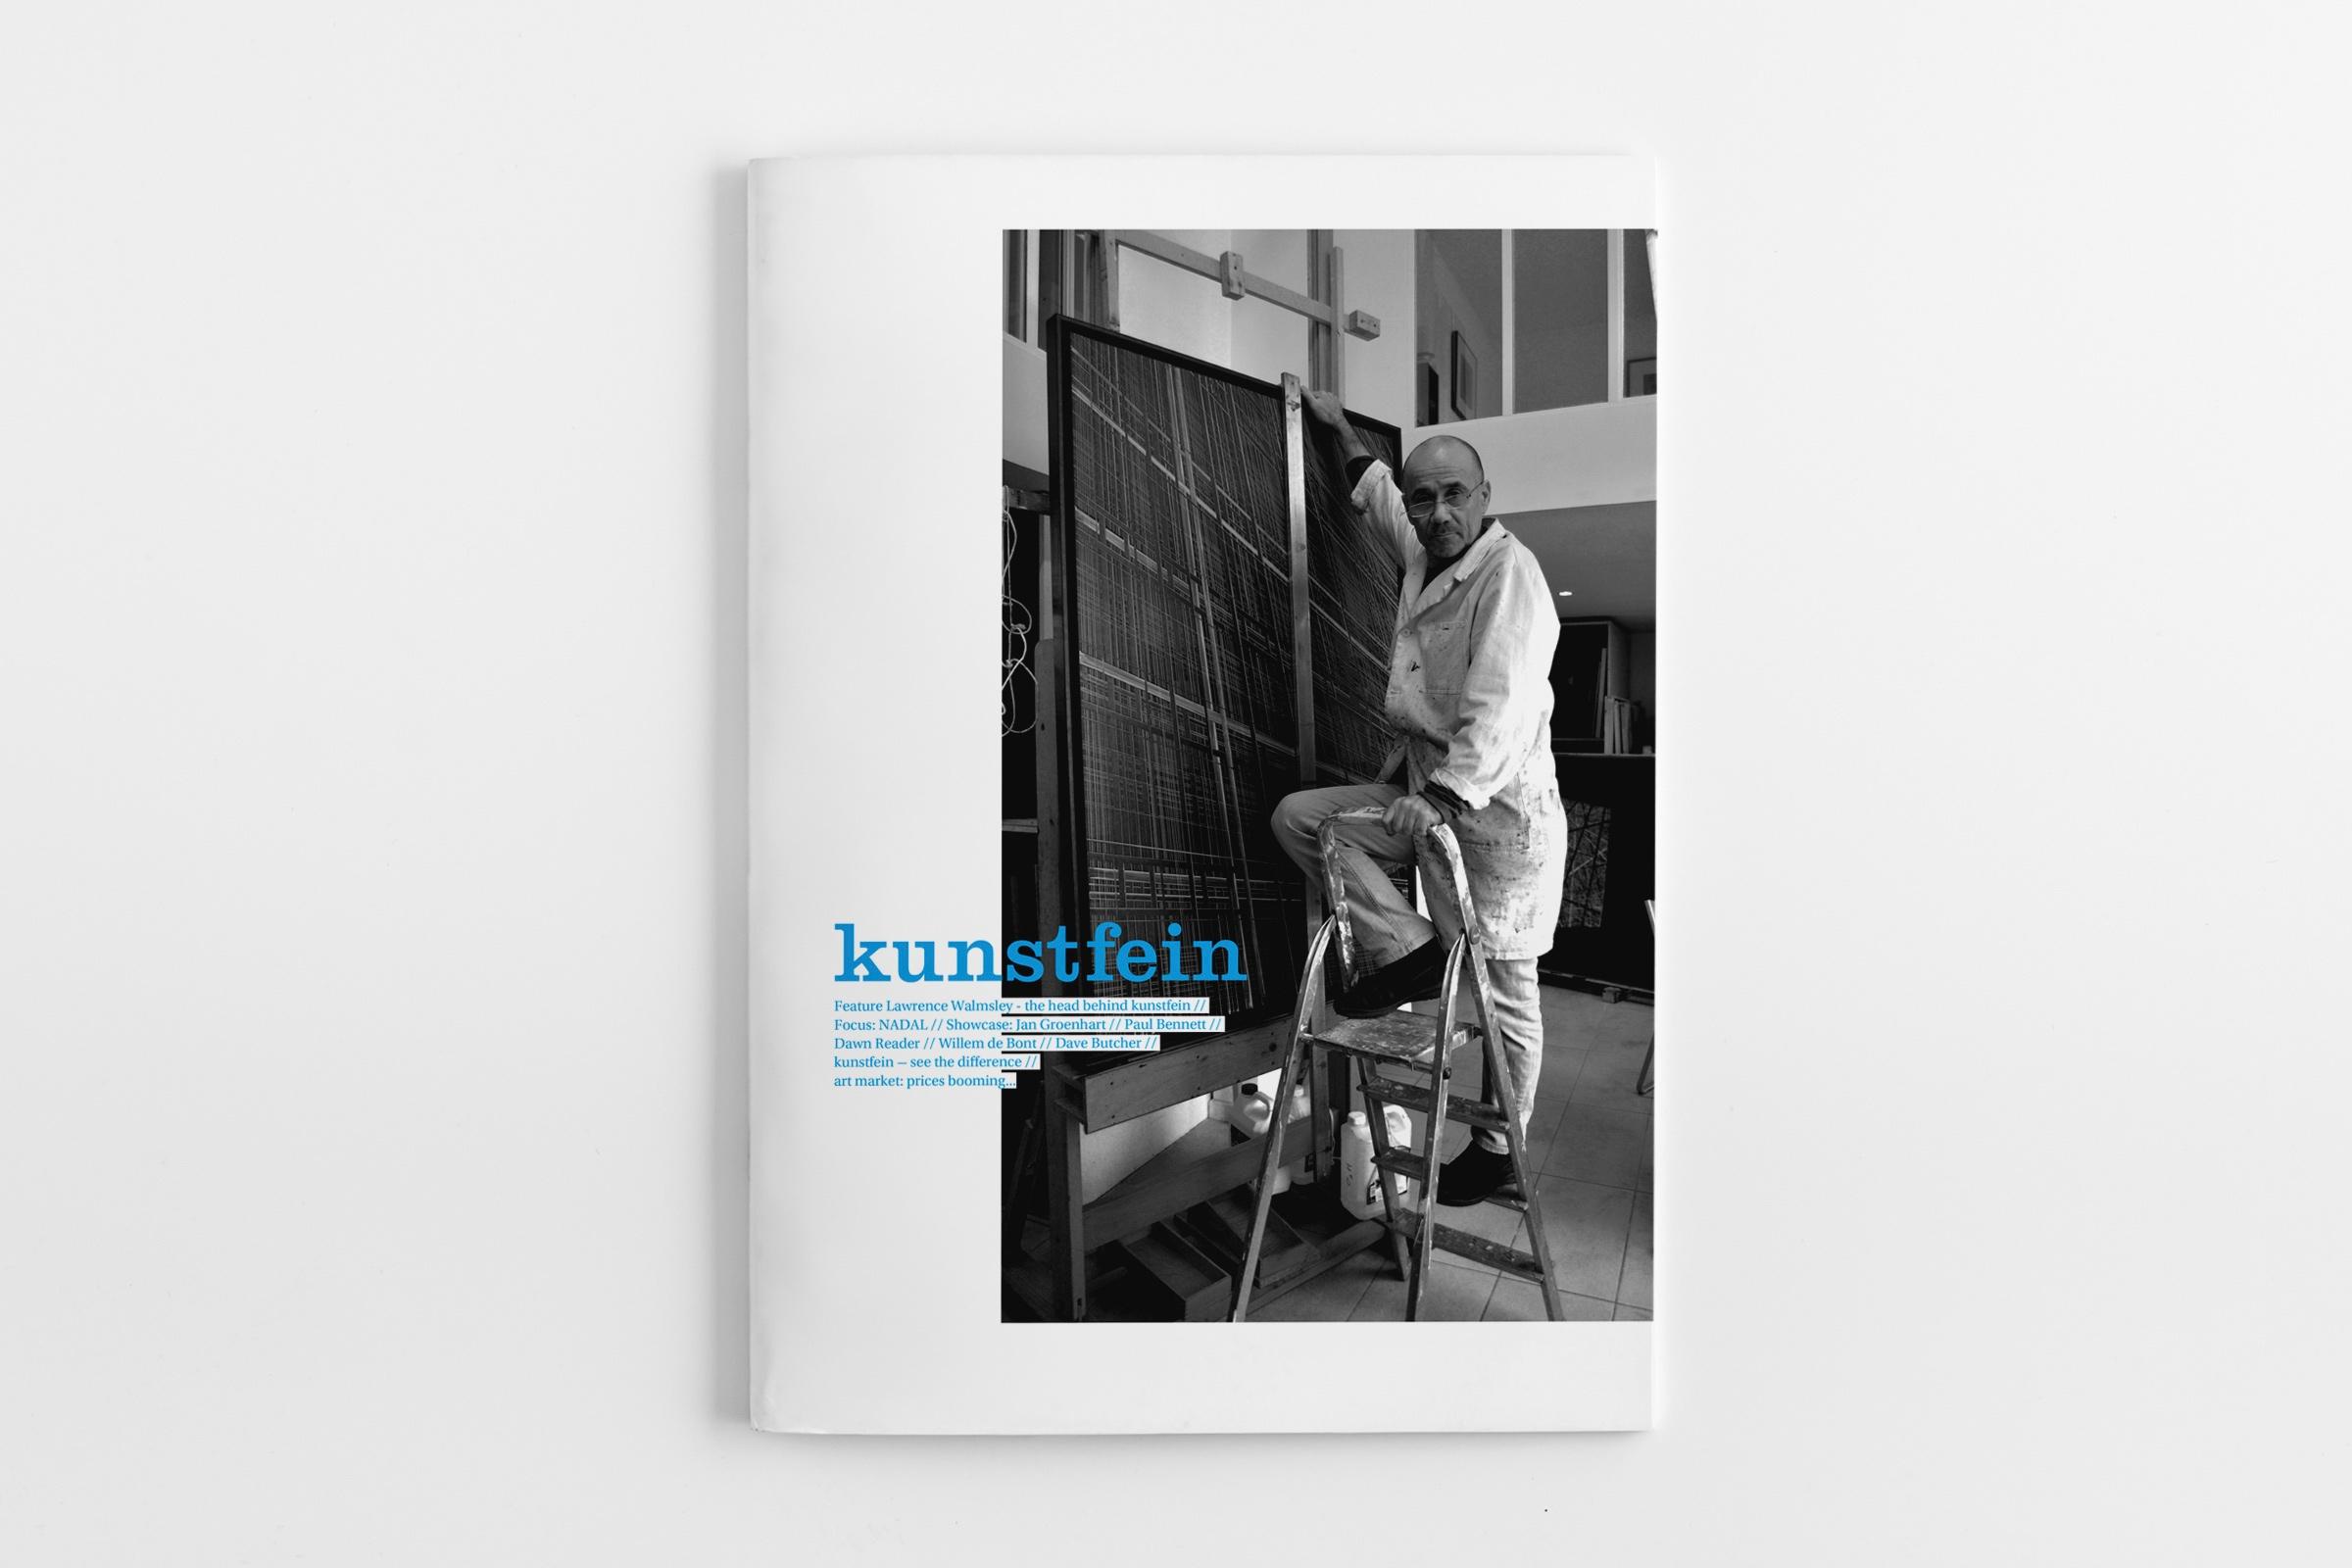 Kunstfein - Editorial Design